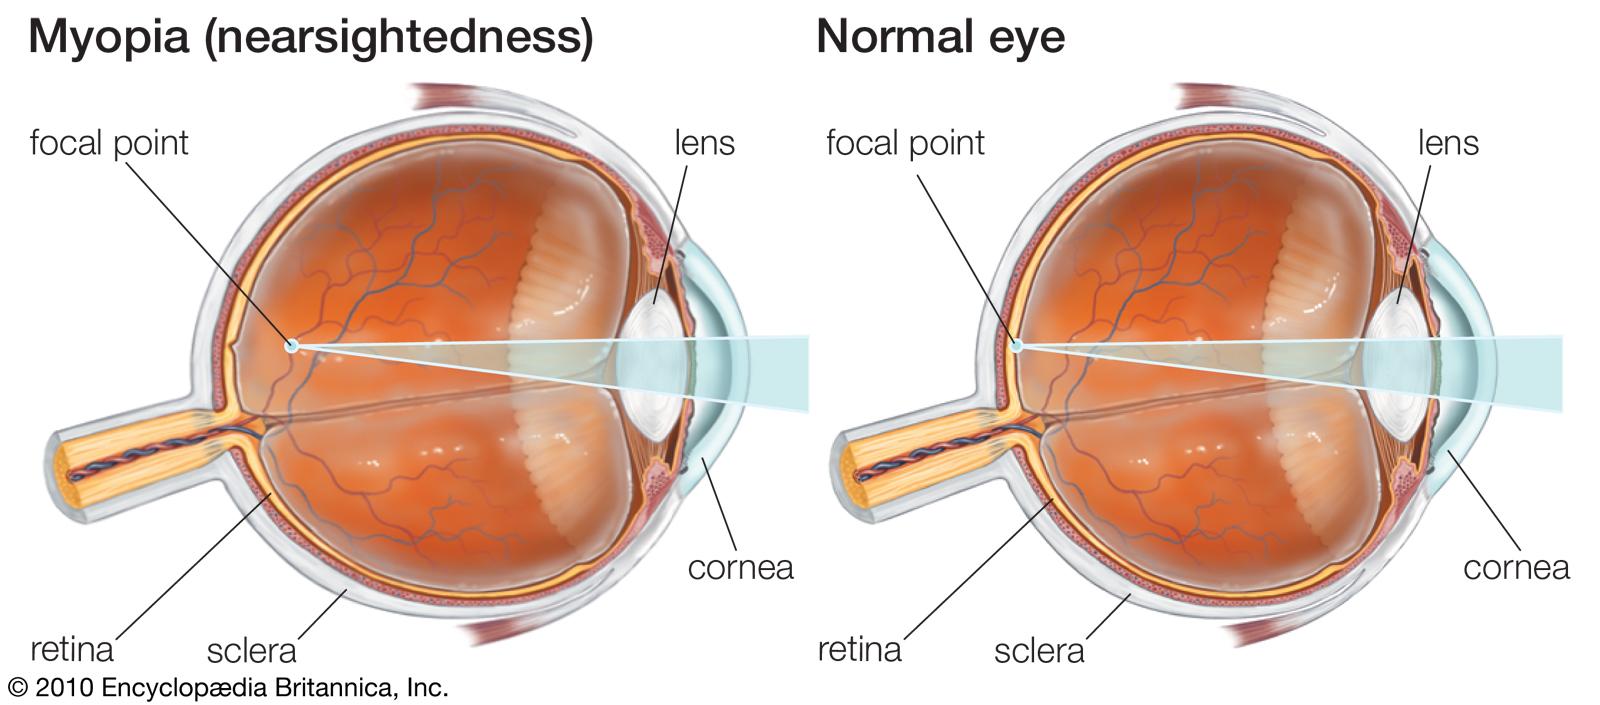 Presbyopia & Myopia